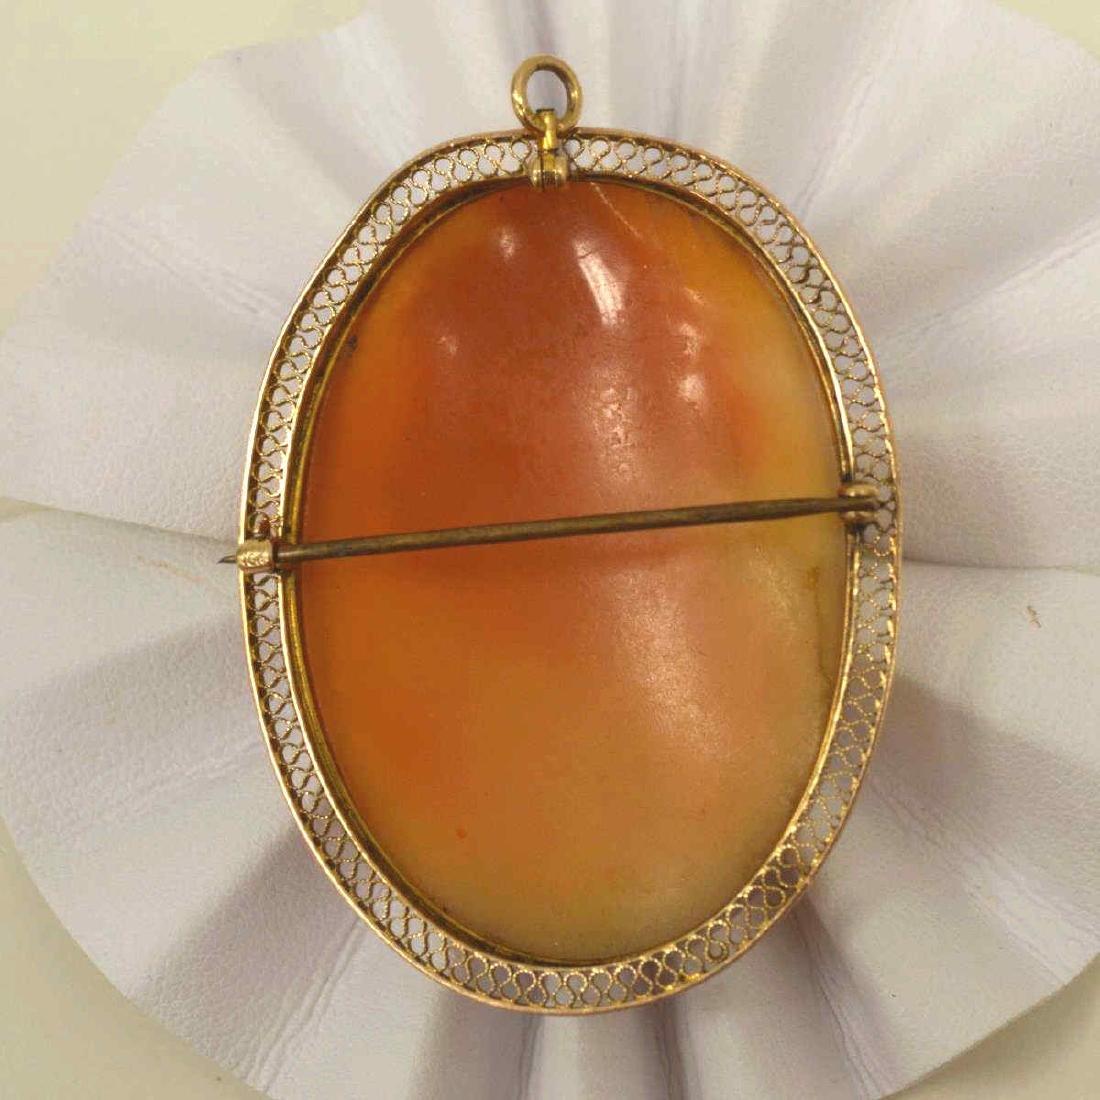 10kt yellow gold cameo pin - 2